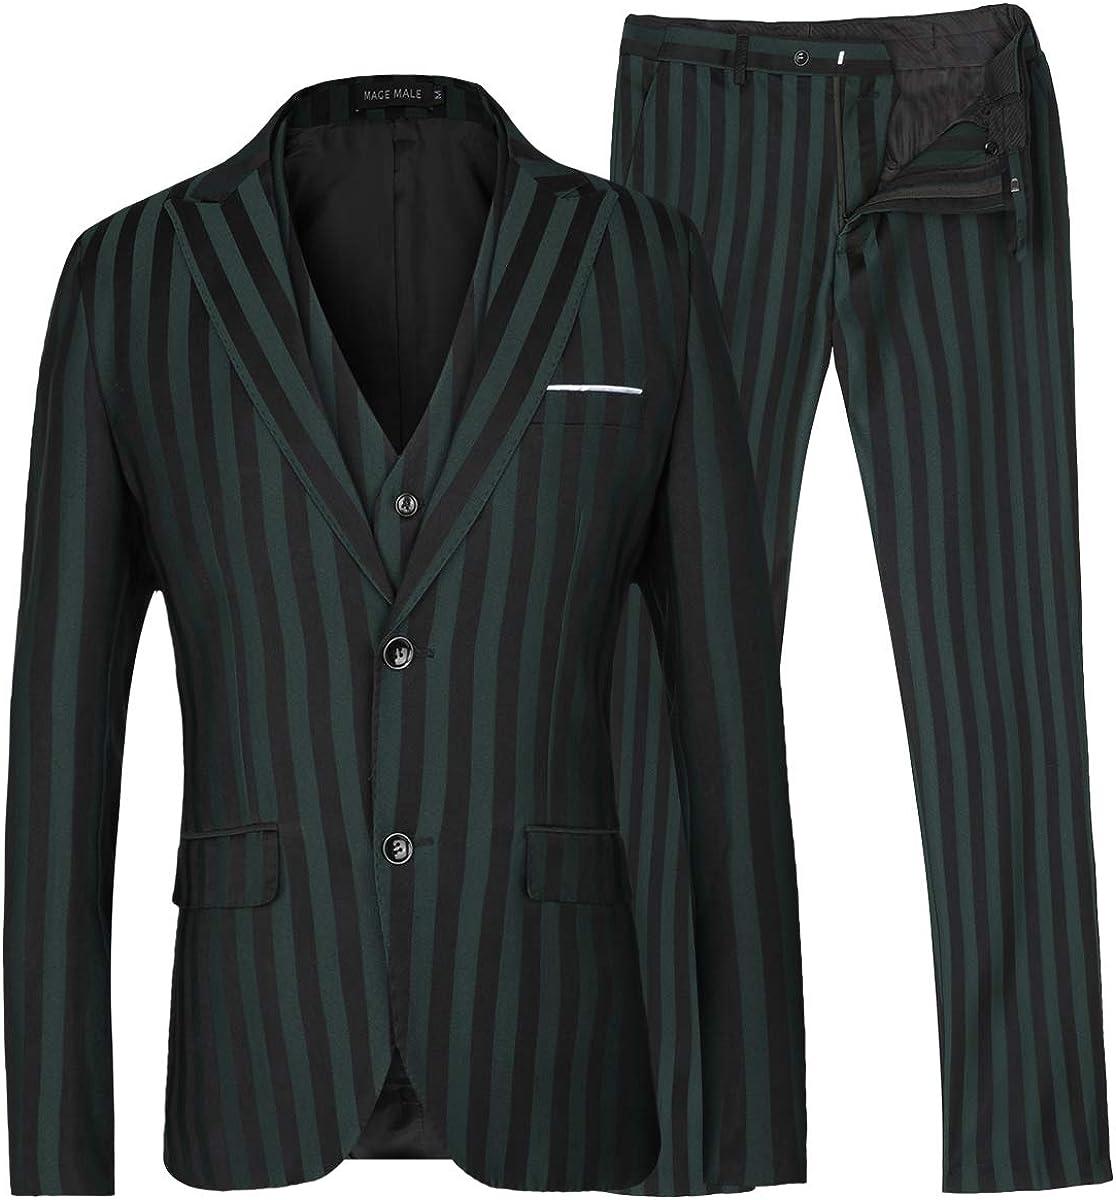 Men/'s Navy Blue Stripe Formal Vest Business Casual Waistcoat XS-3XL